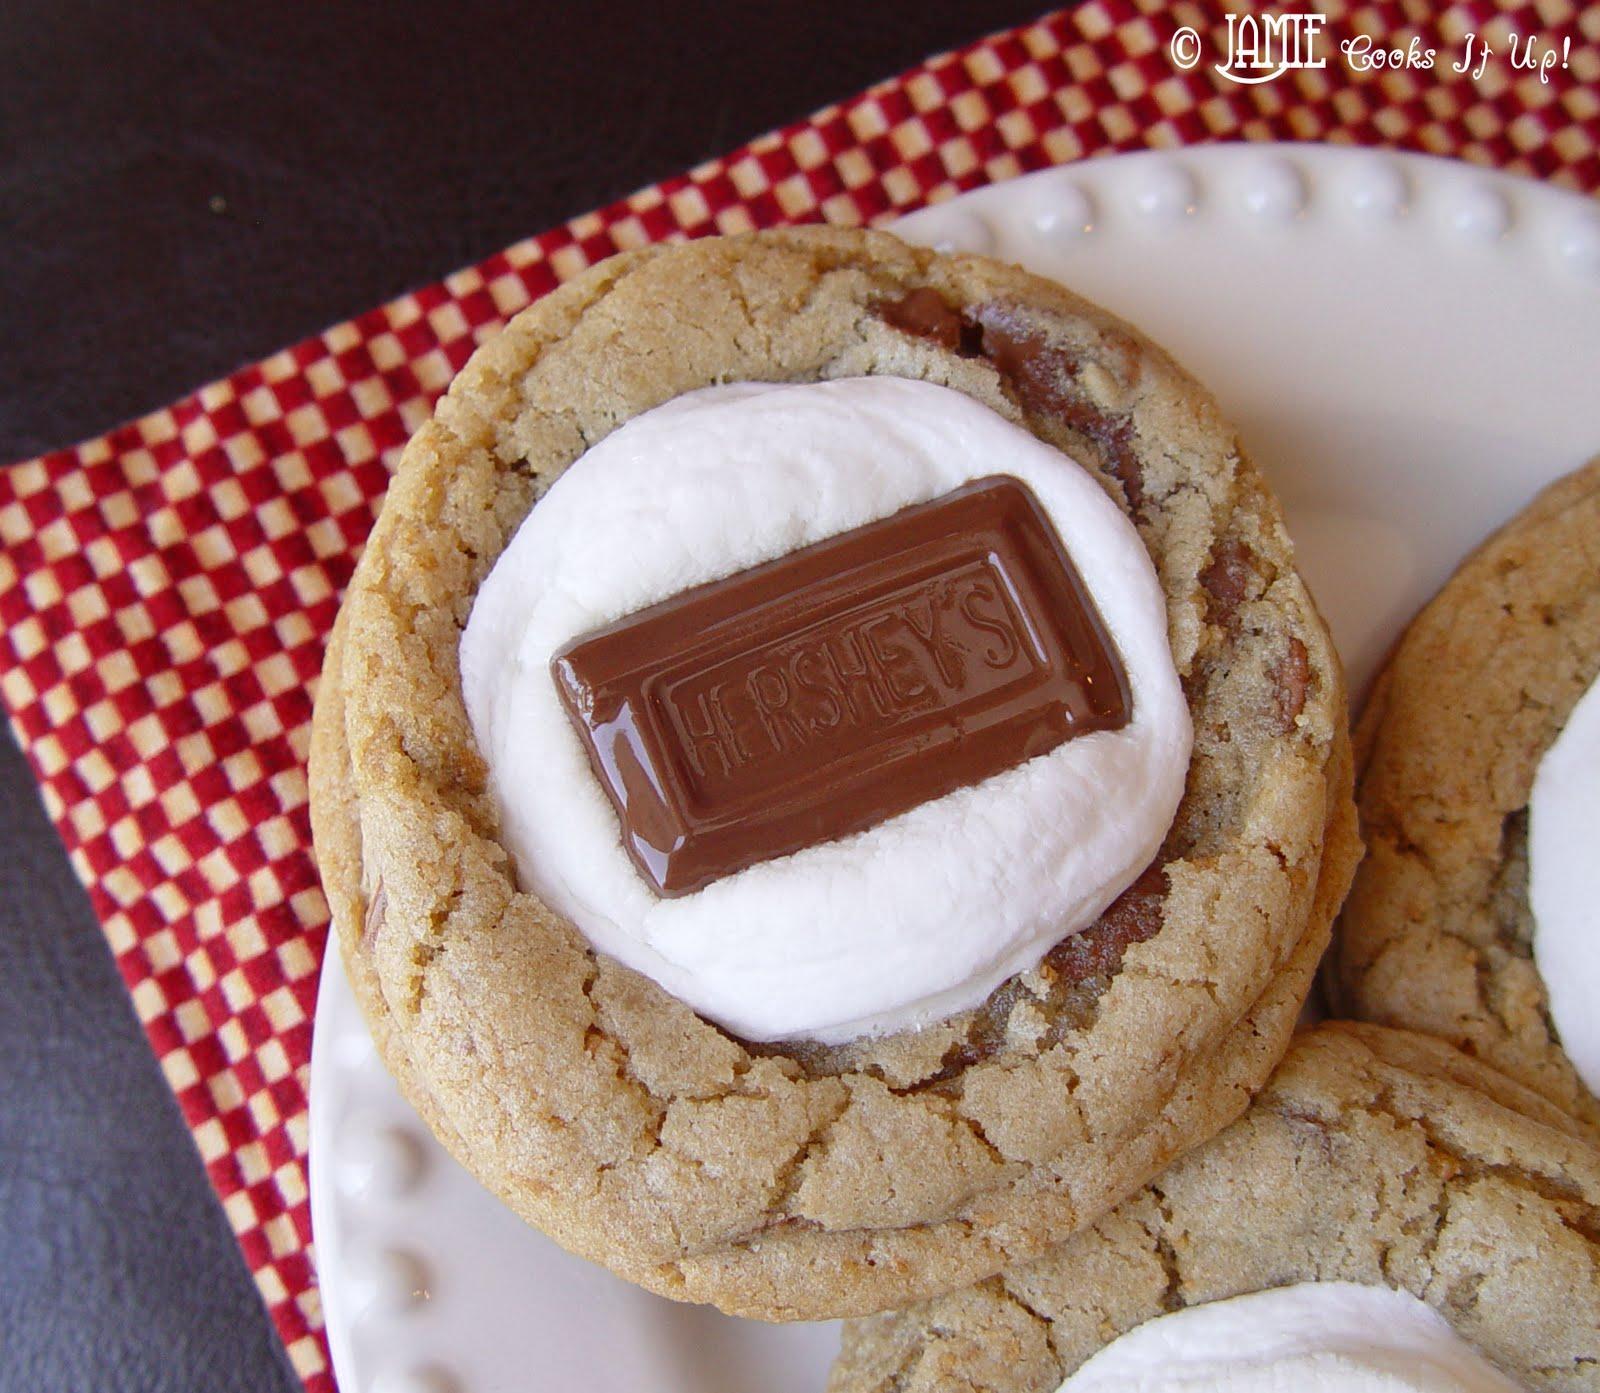 Fun Bbq Recipes: Smore Cookies